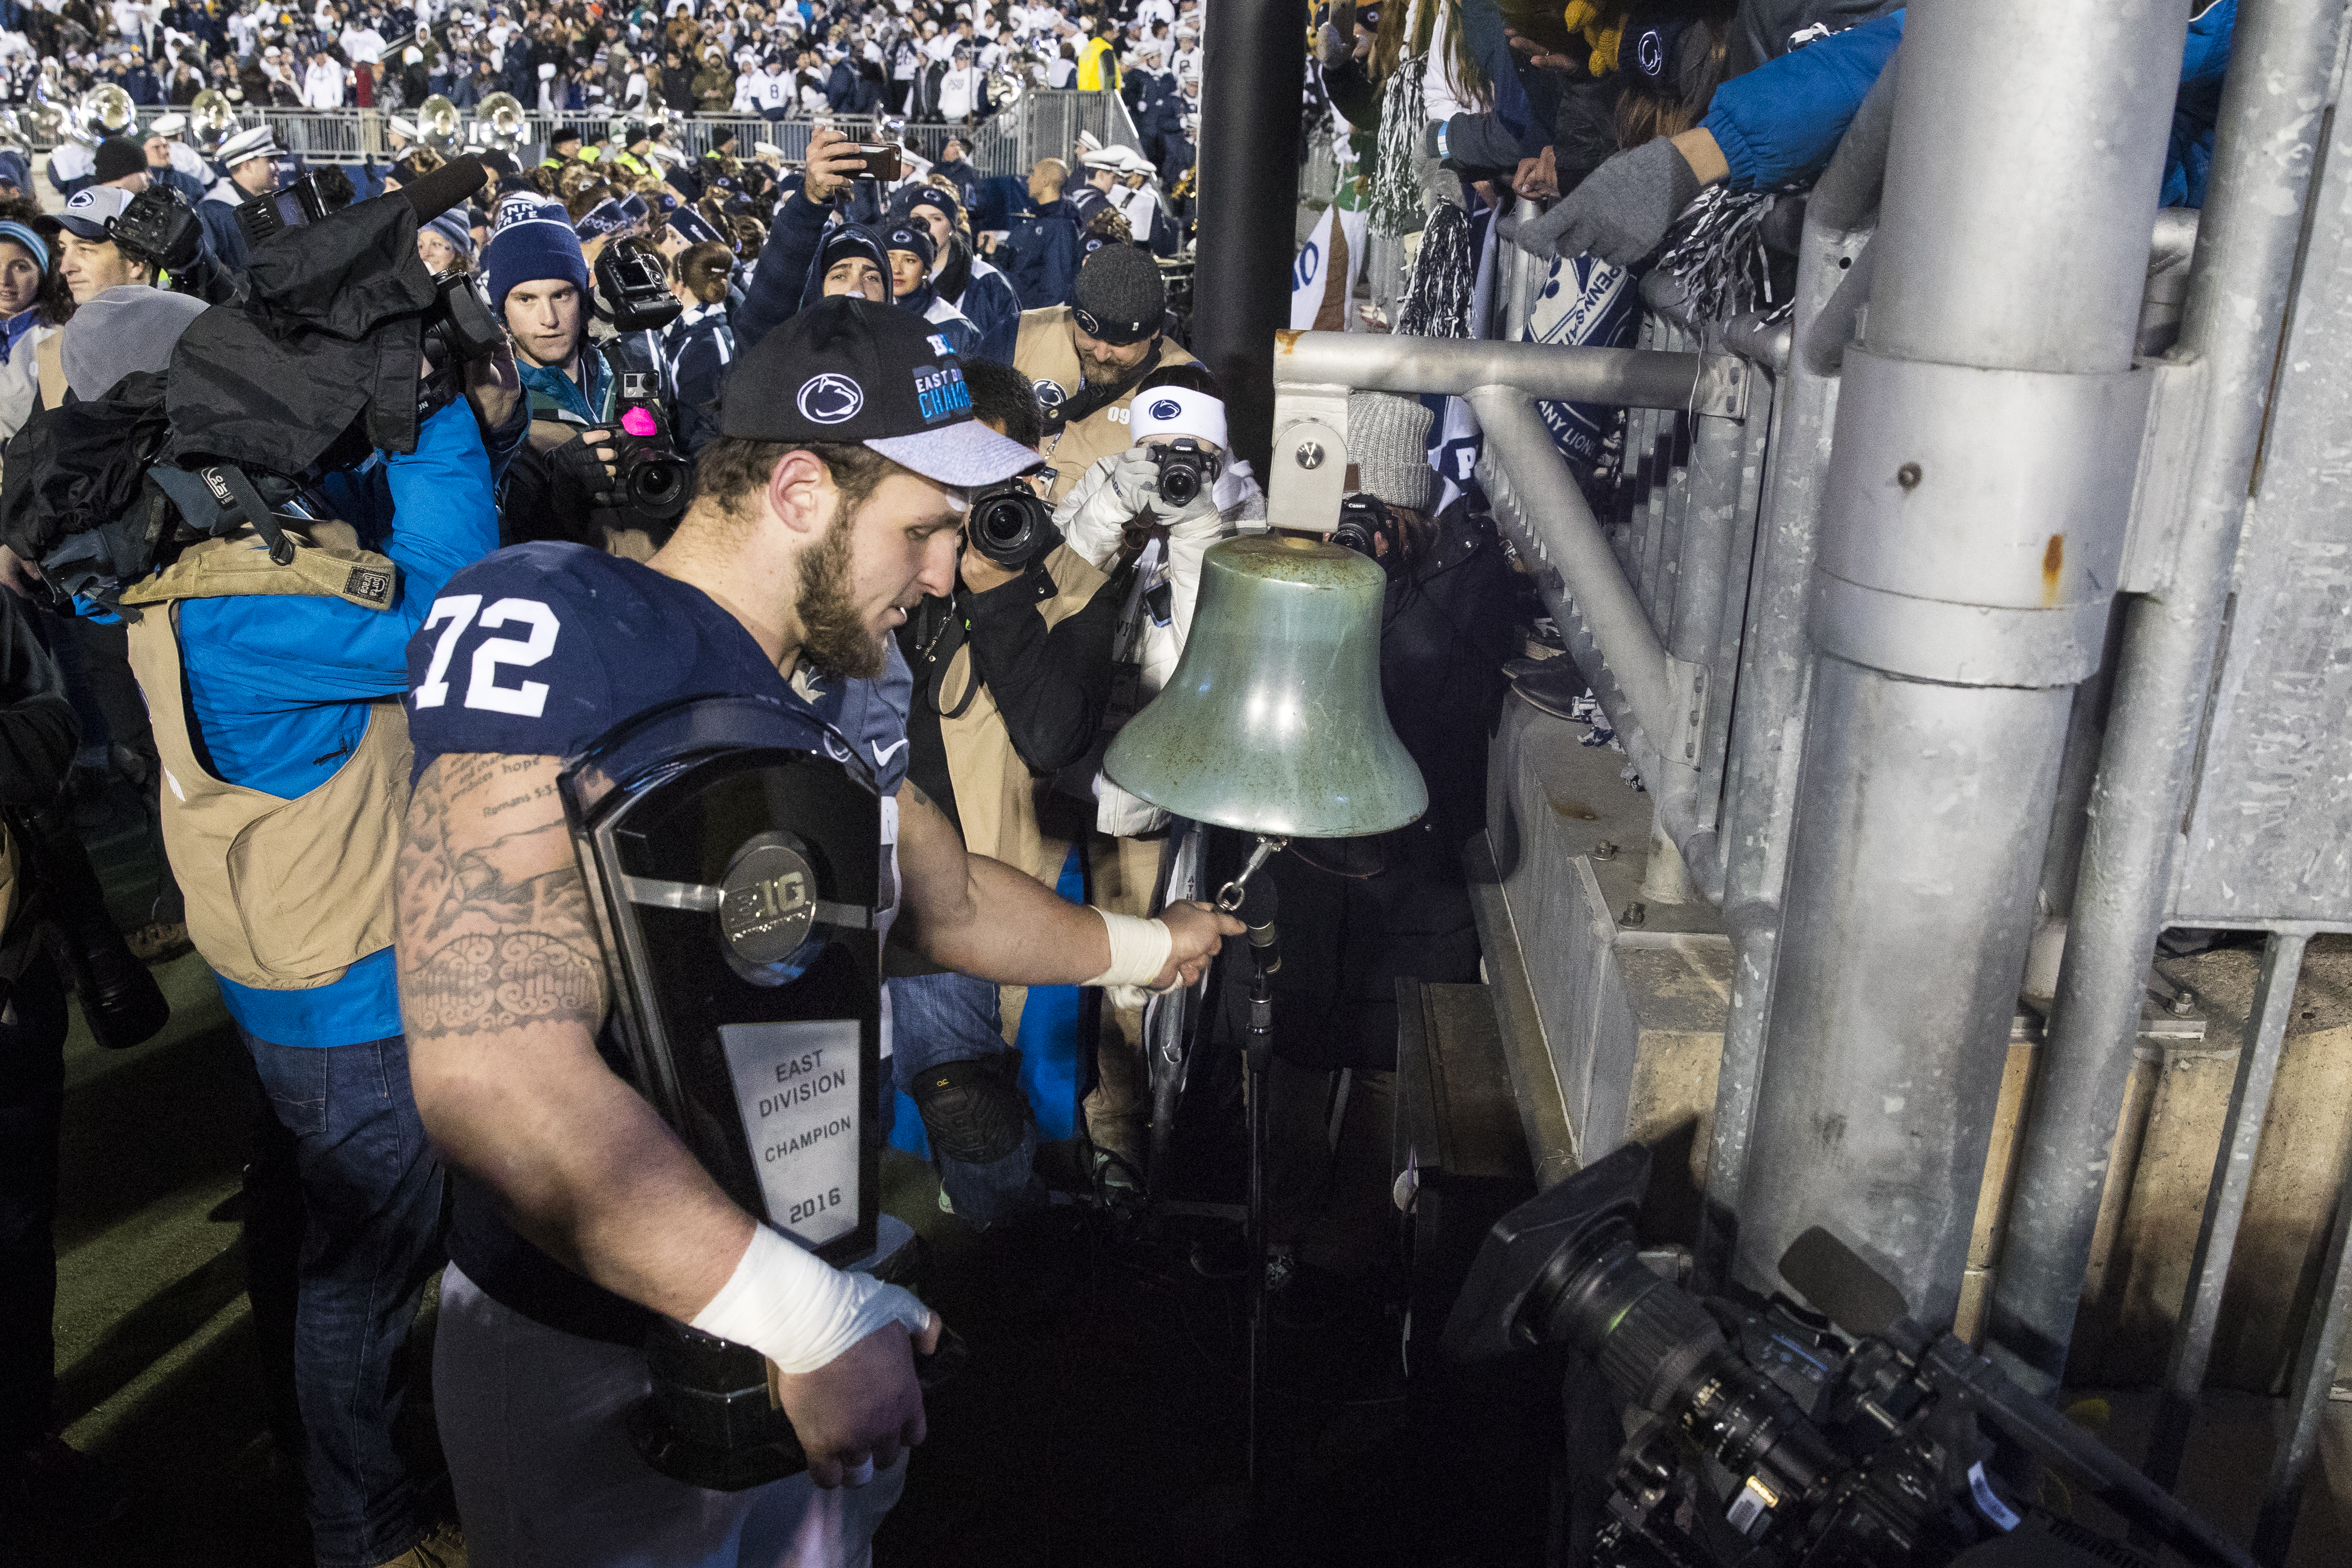 Michigan State v Penn State